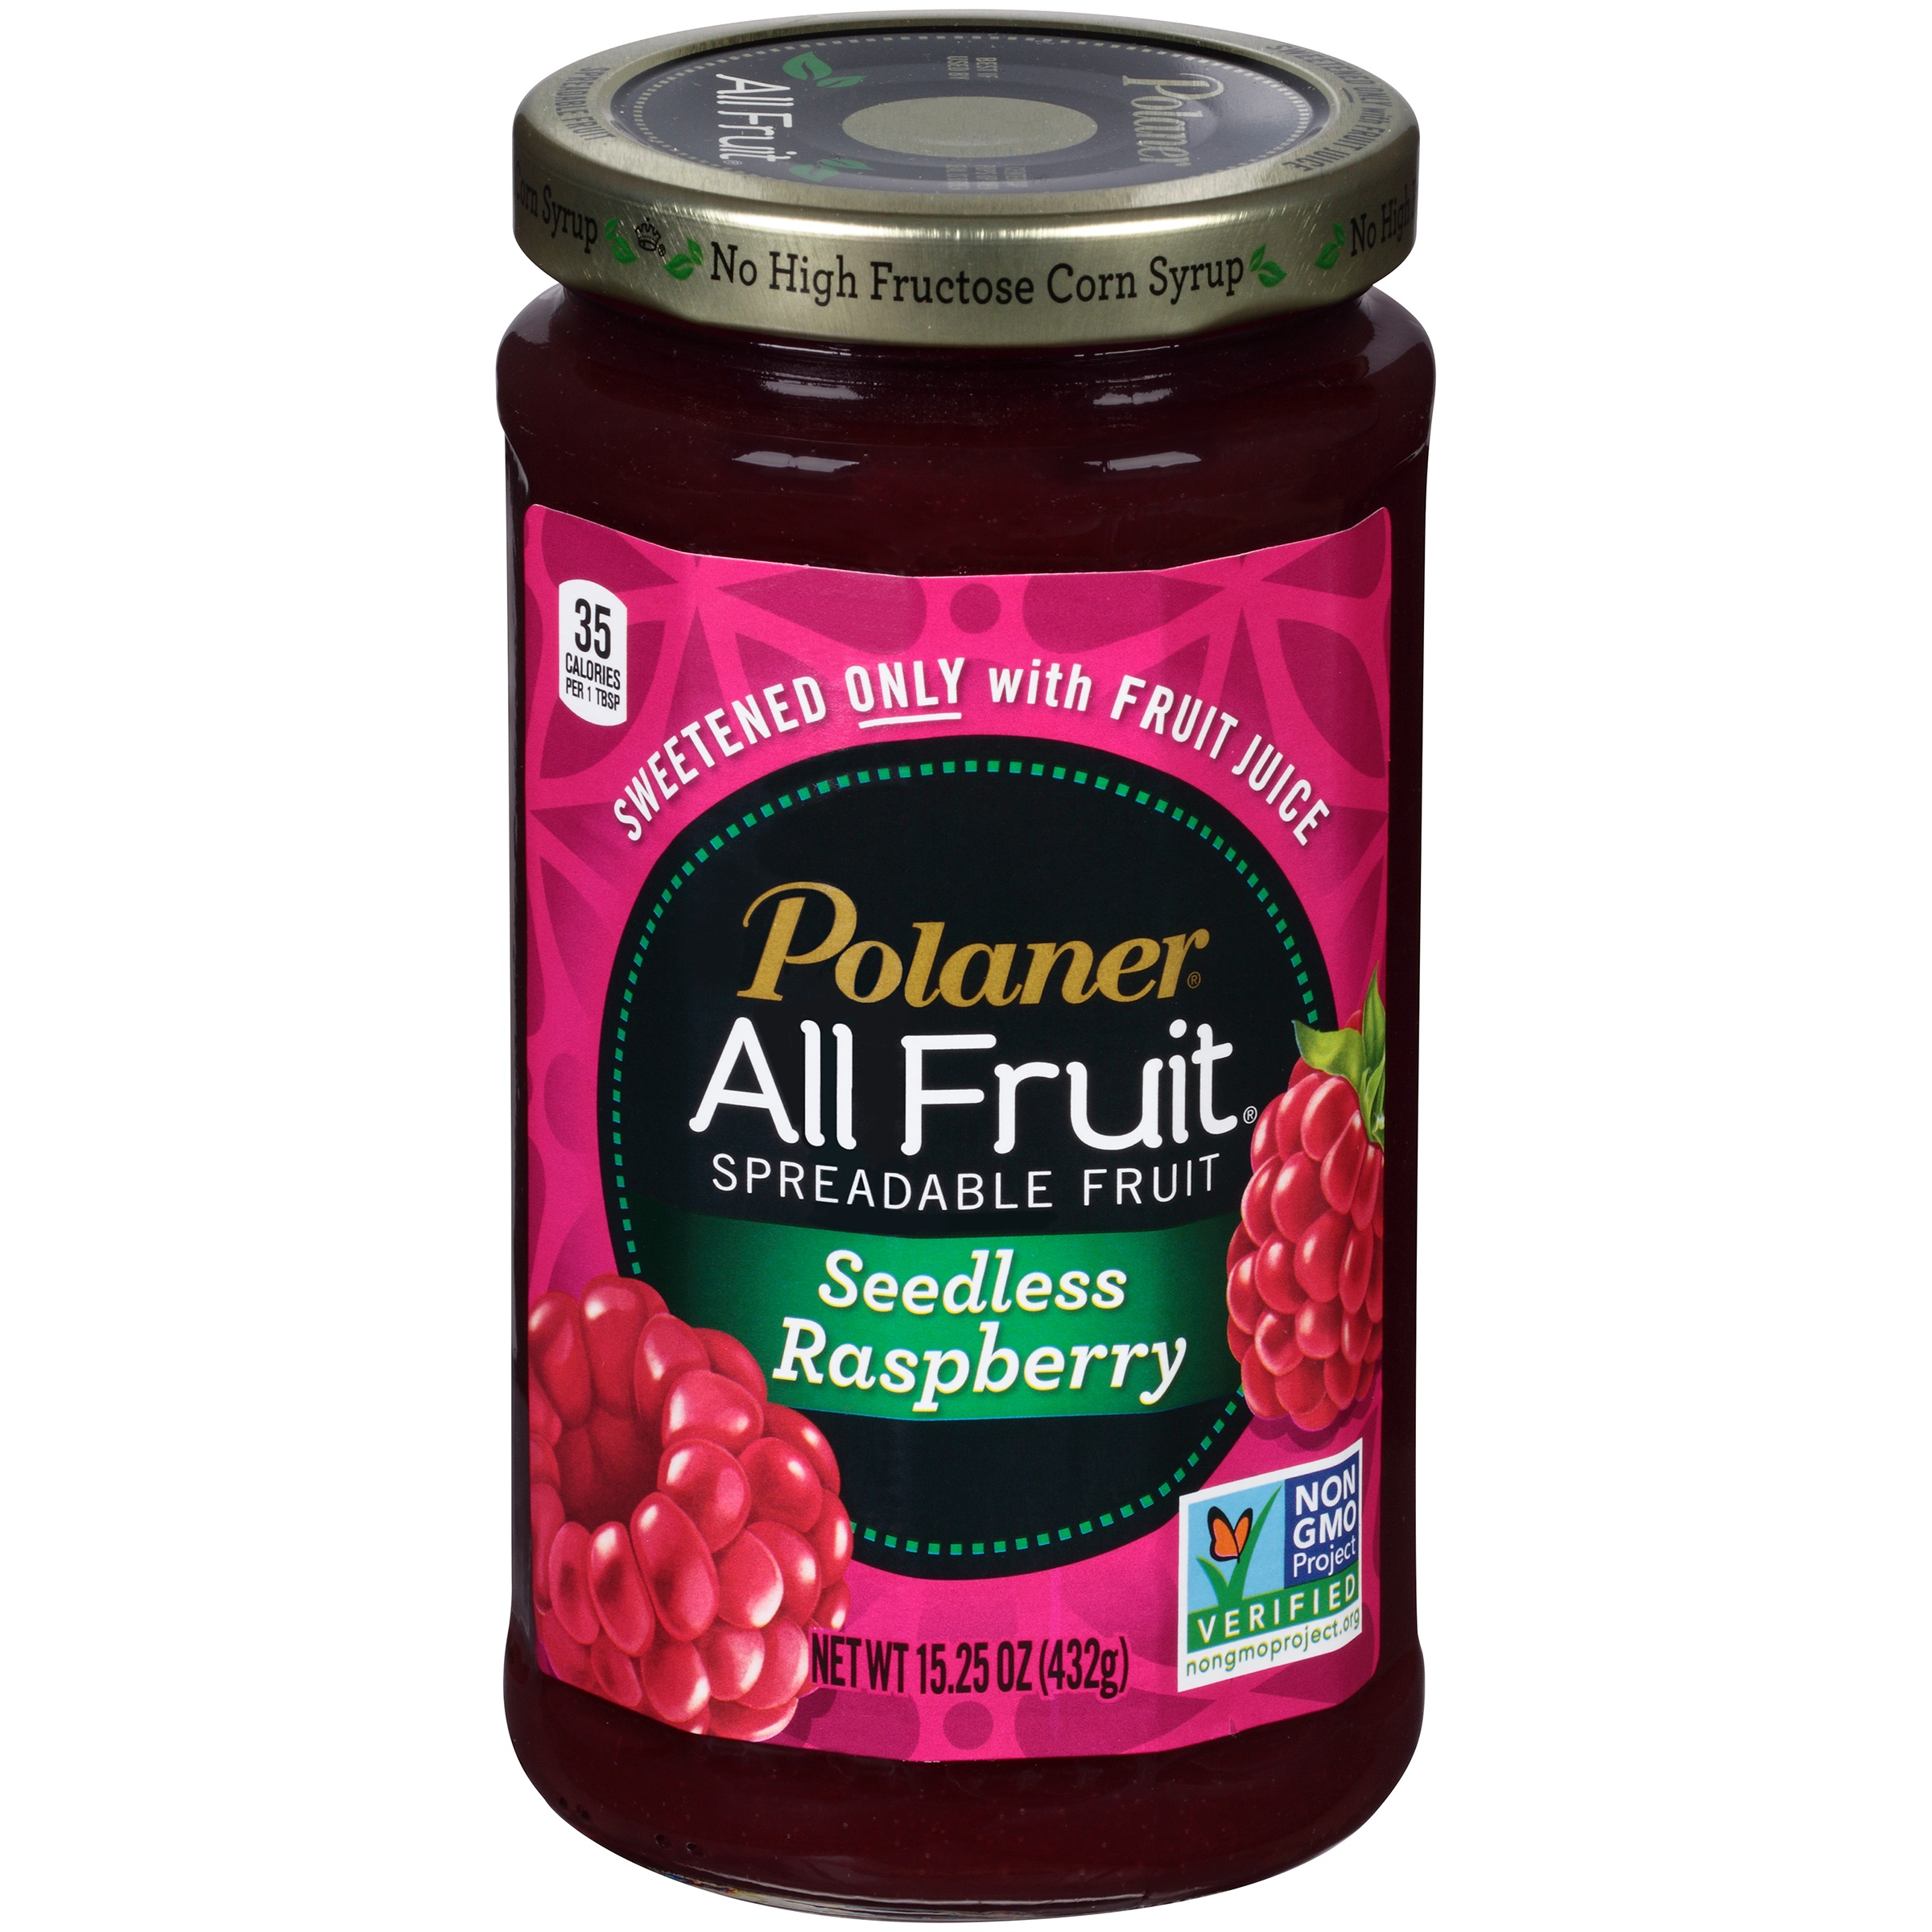 Polaner All Fruit Spreadable Fruit Seedless Raspberry, 15.25 oz